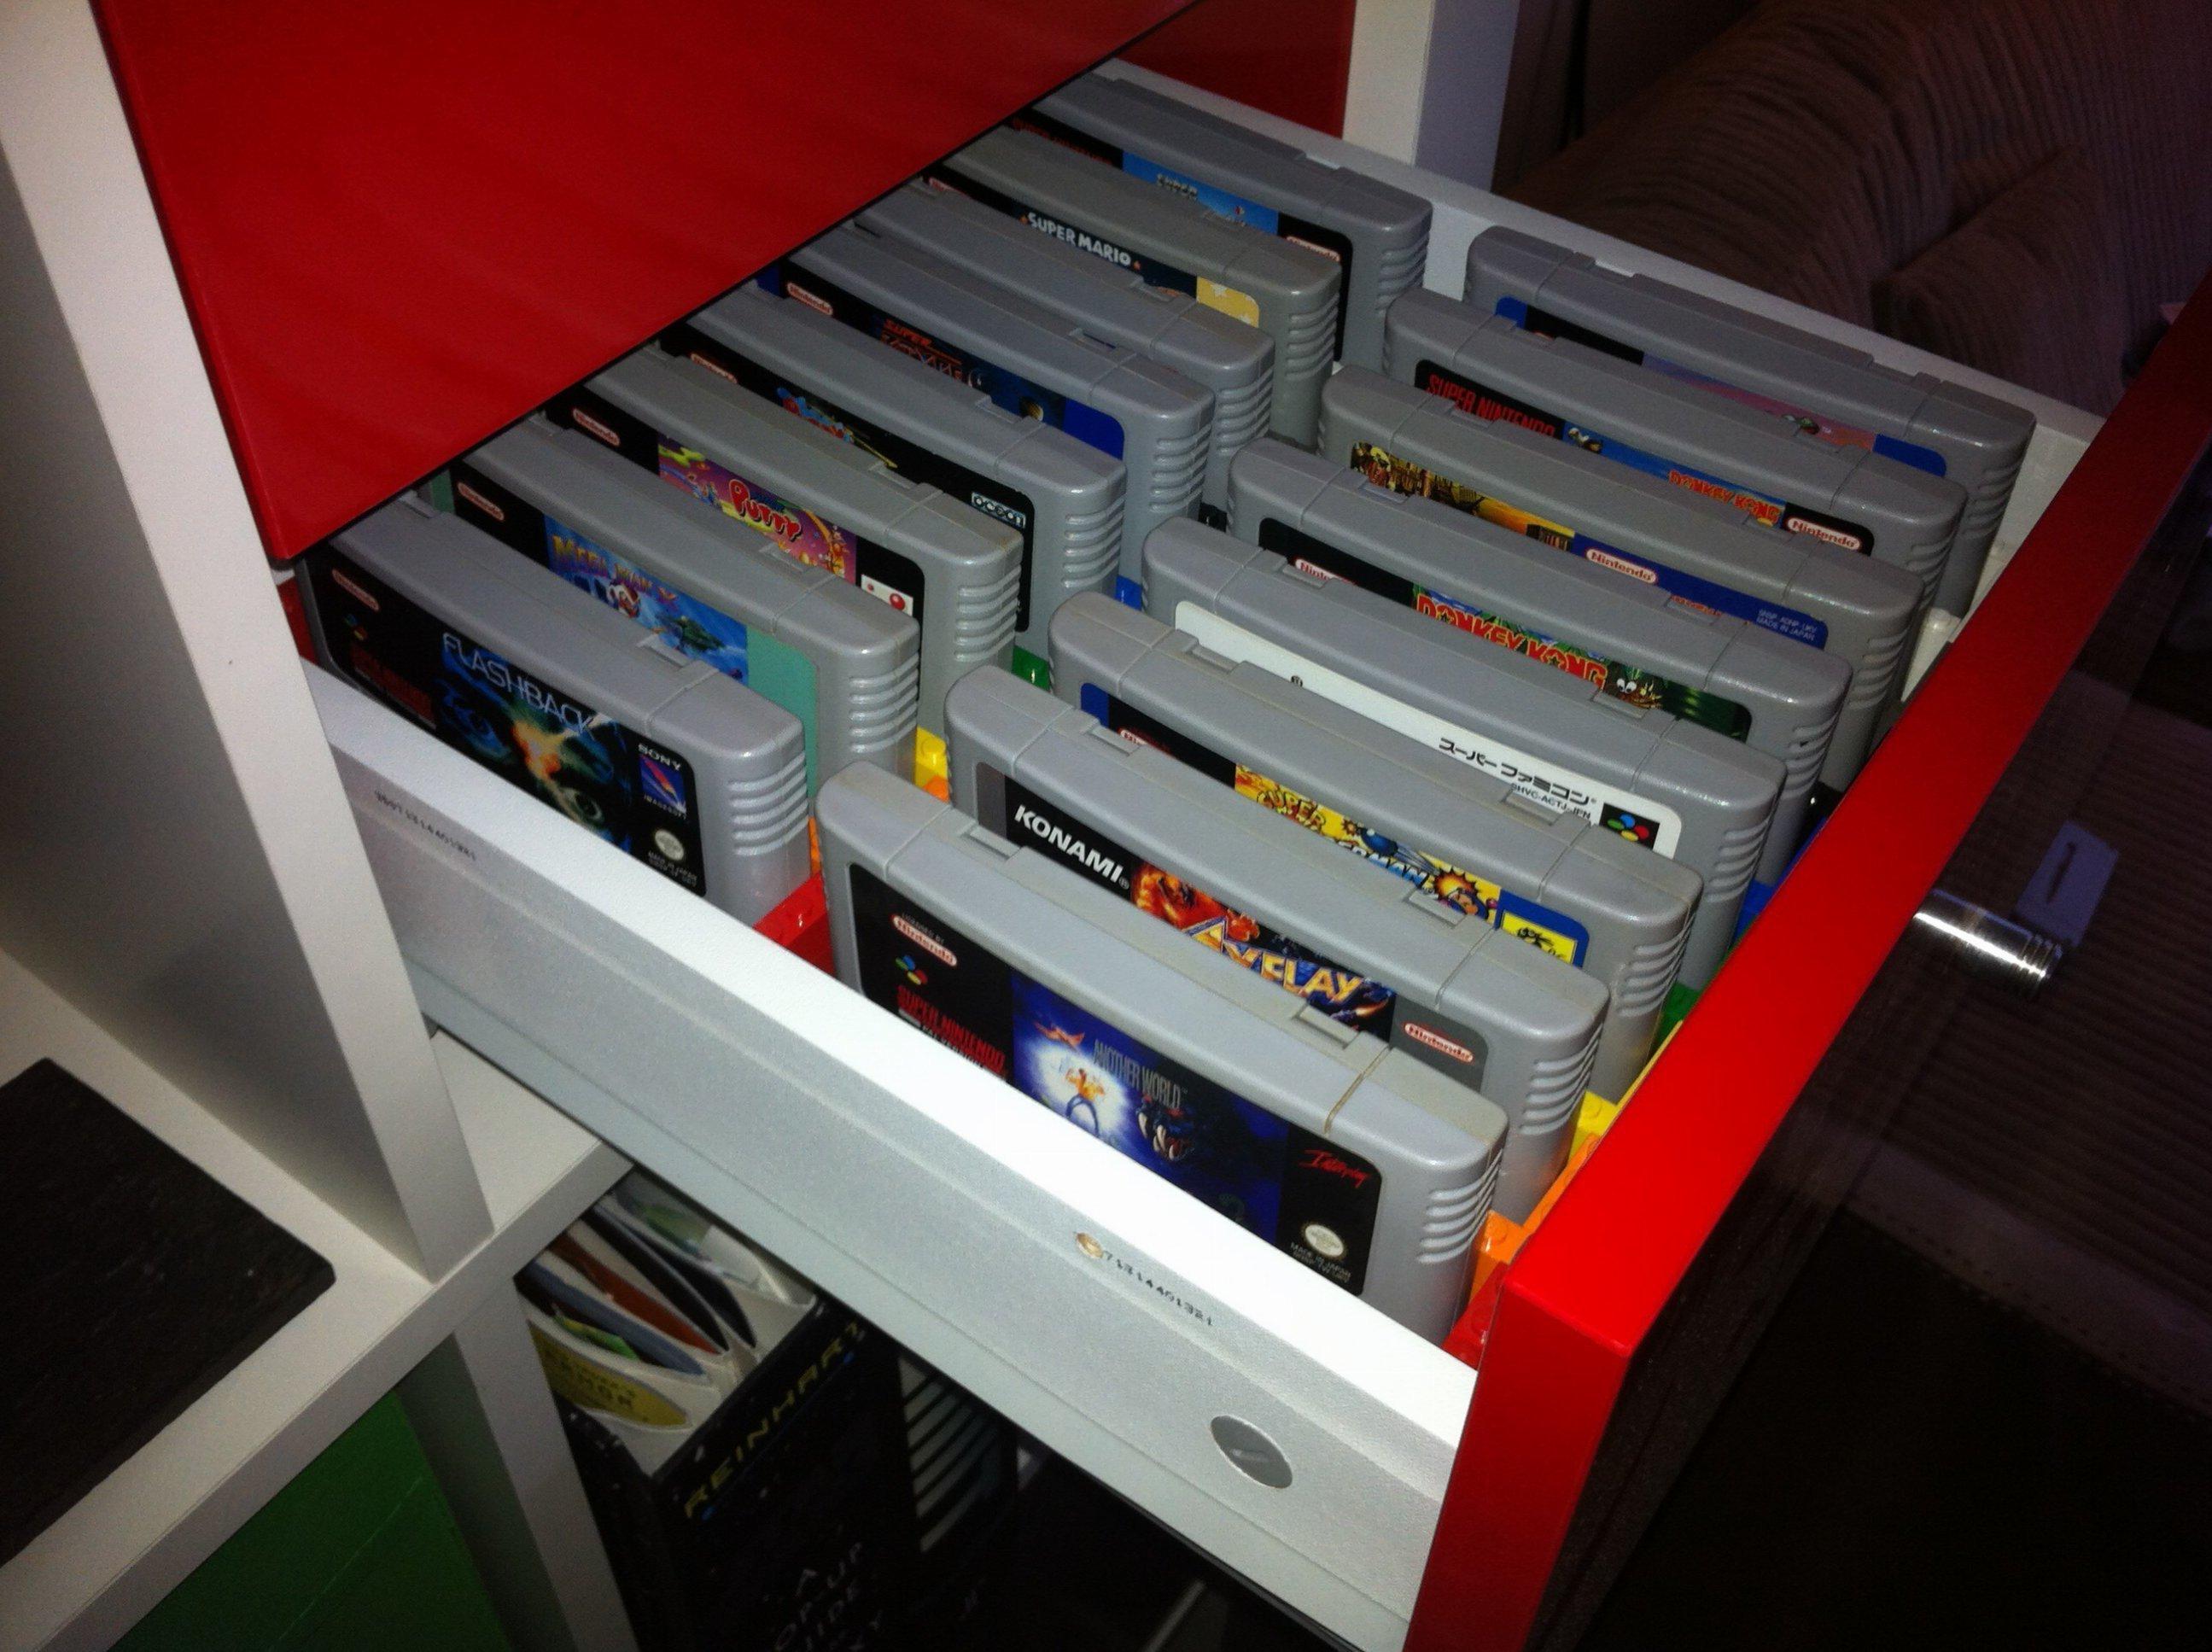 My Raspberry Pi + Retrode SNES case mod | GBAtemp net - The